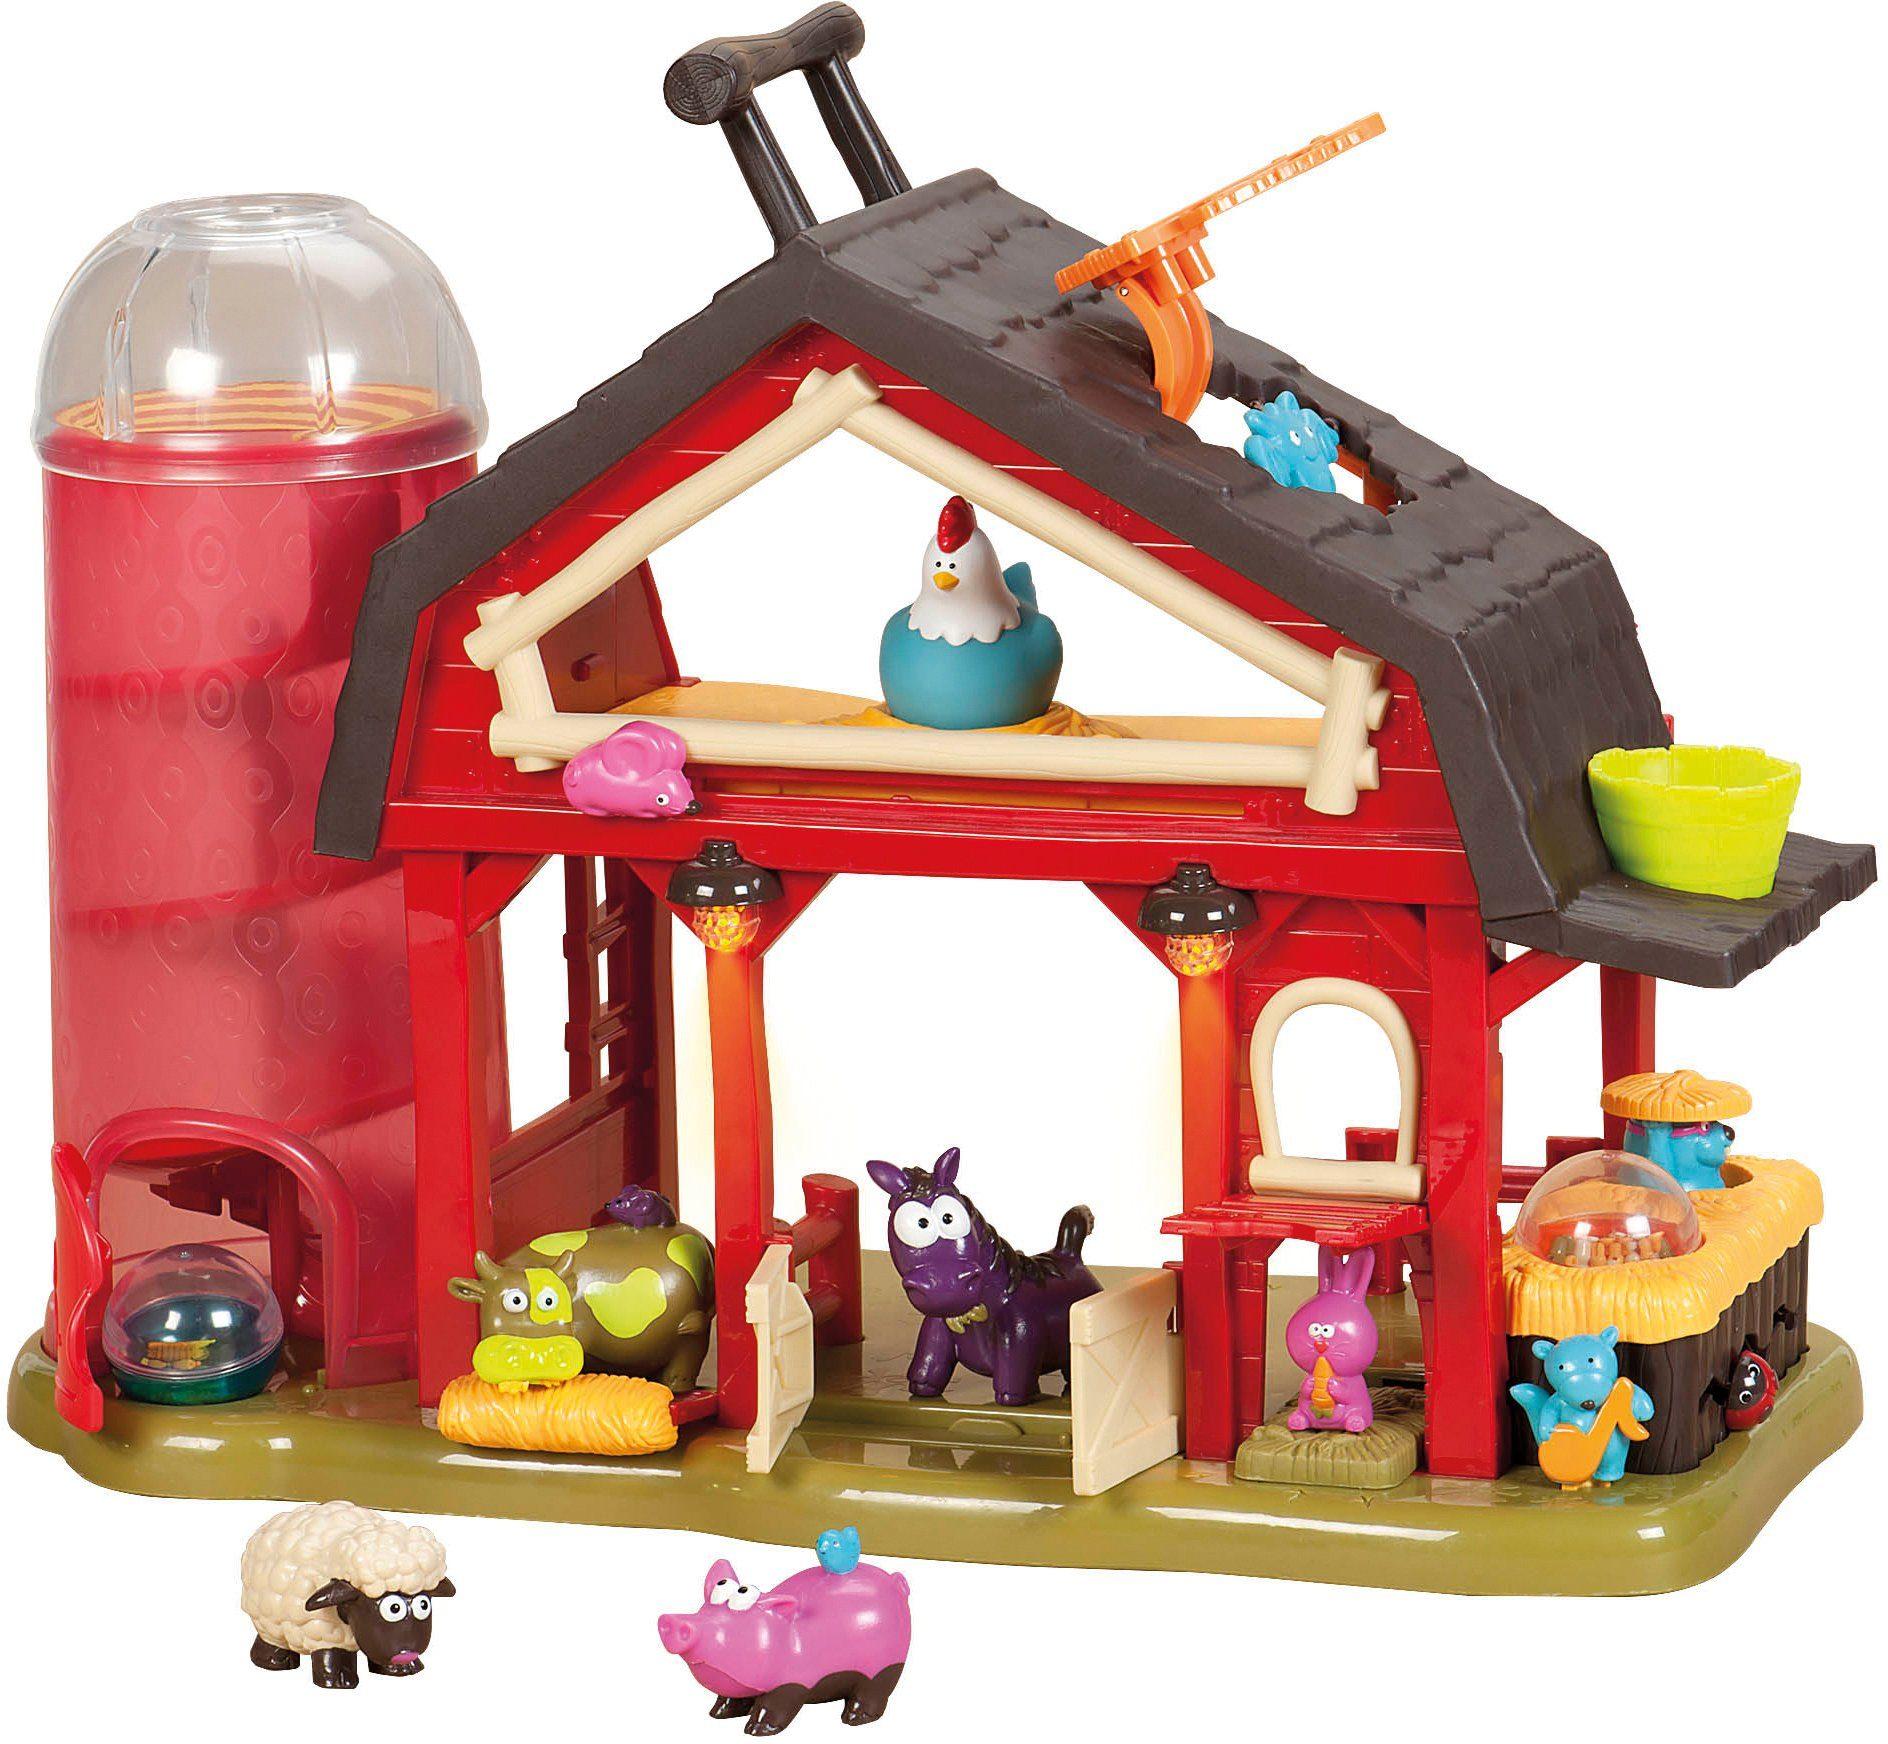 B.toys Bauernhof, »Baa-Baa-Barn«